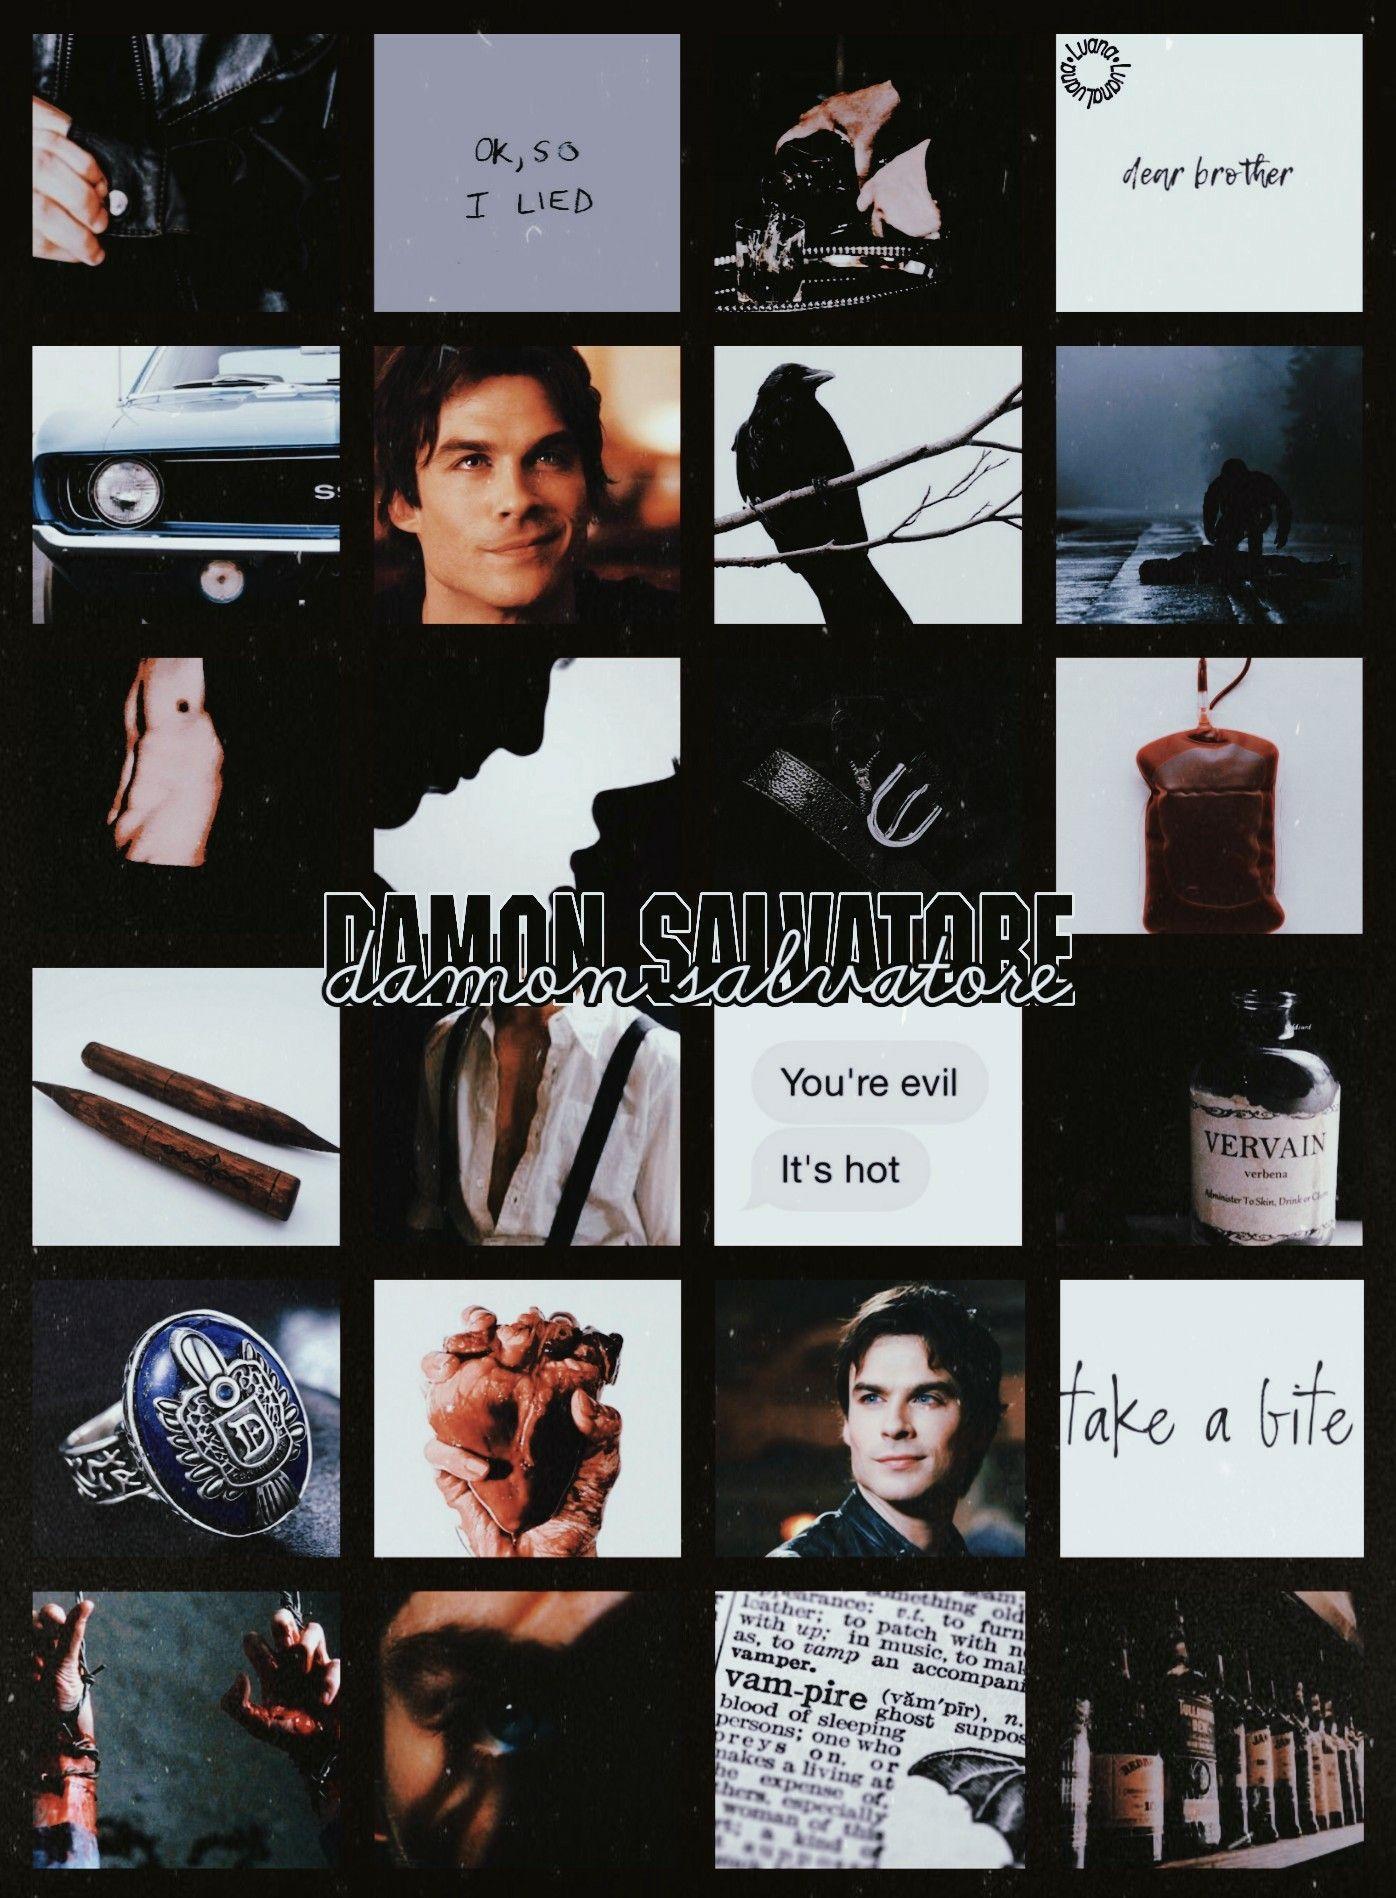 Damon Wallpaper Aesthetic Aesthetic 2 0 Damon Salvatore The Vampire Diaries Damon Salvatore Vampire Diaries Vampire Diaries Damon Vampire Diaries Wallpaper vampire diaries wallpaper